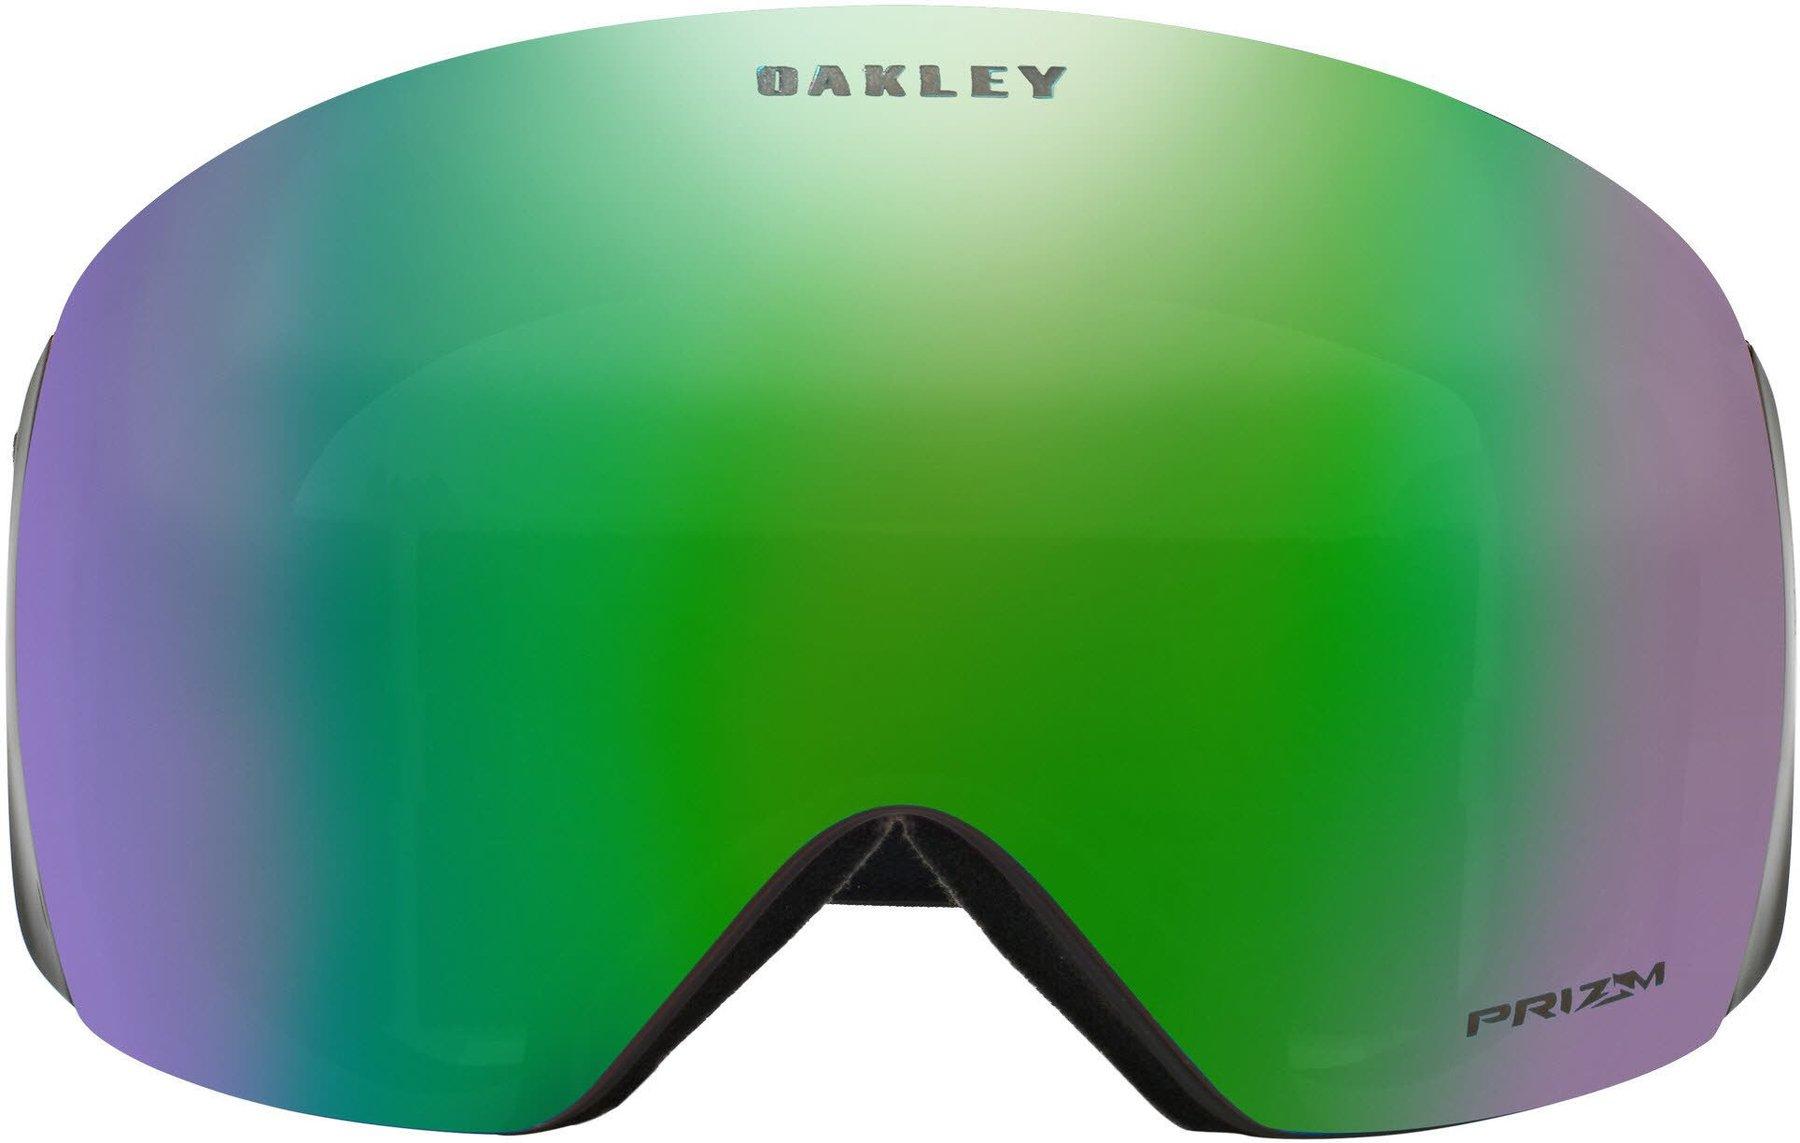 2987a4c22b Oakley Flight Deck XM Prizm ab 79,99 € im Preisvergleich kaufen